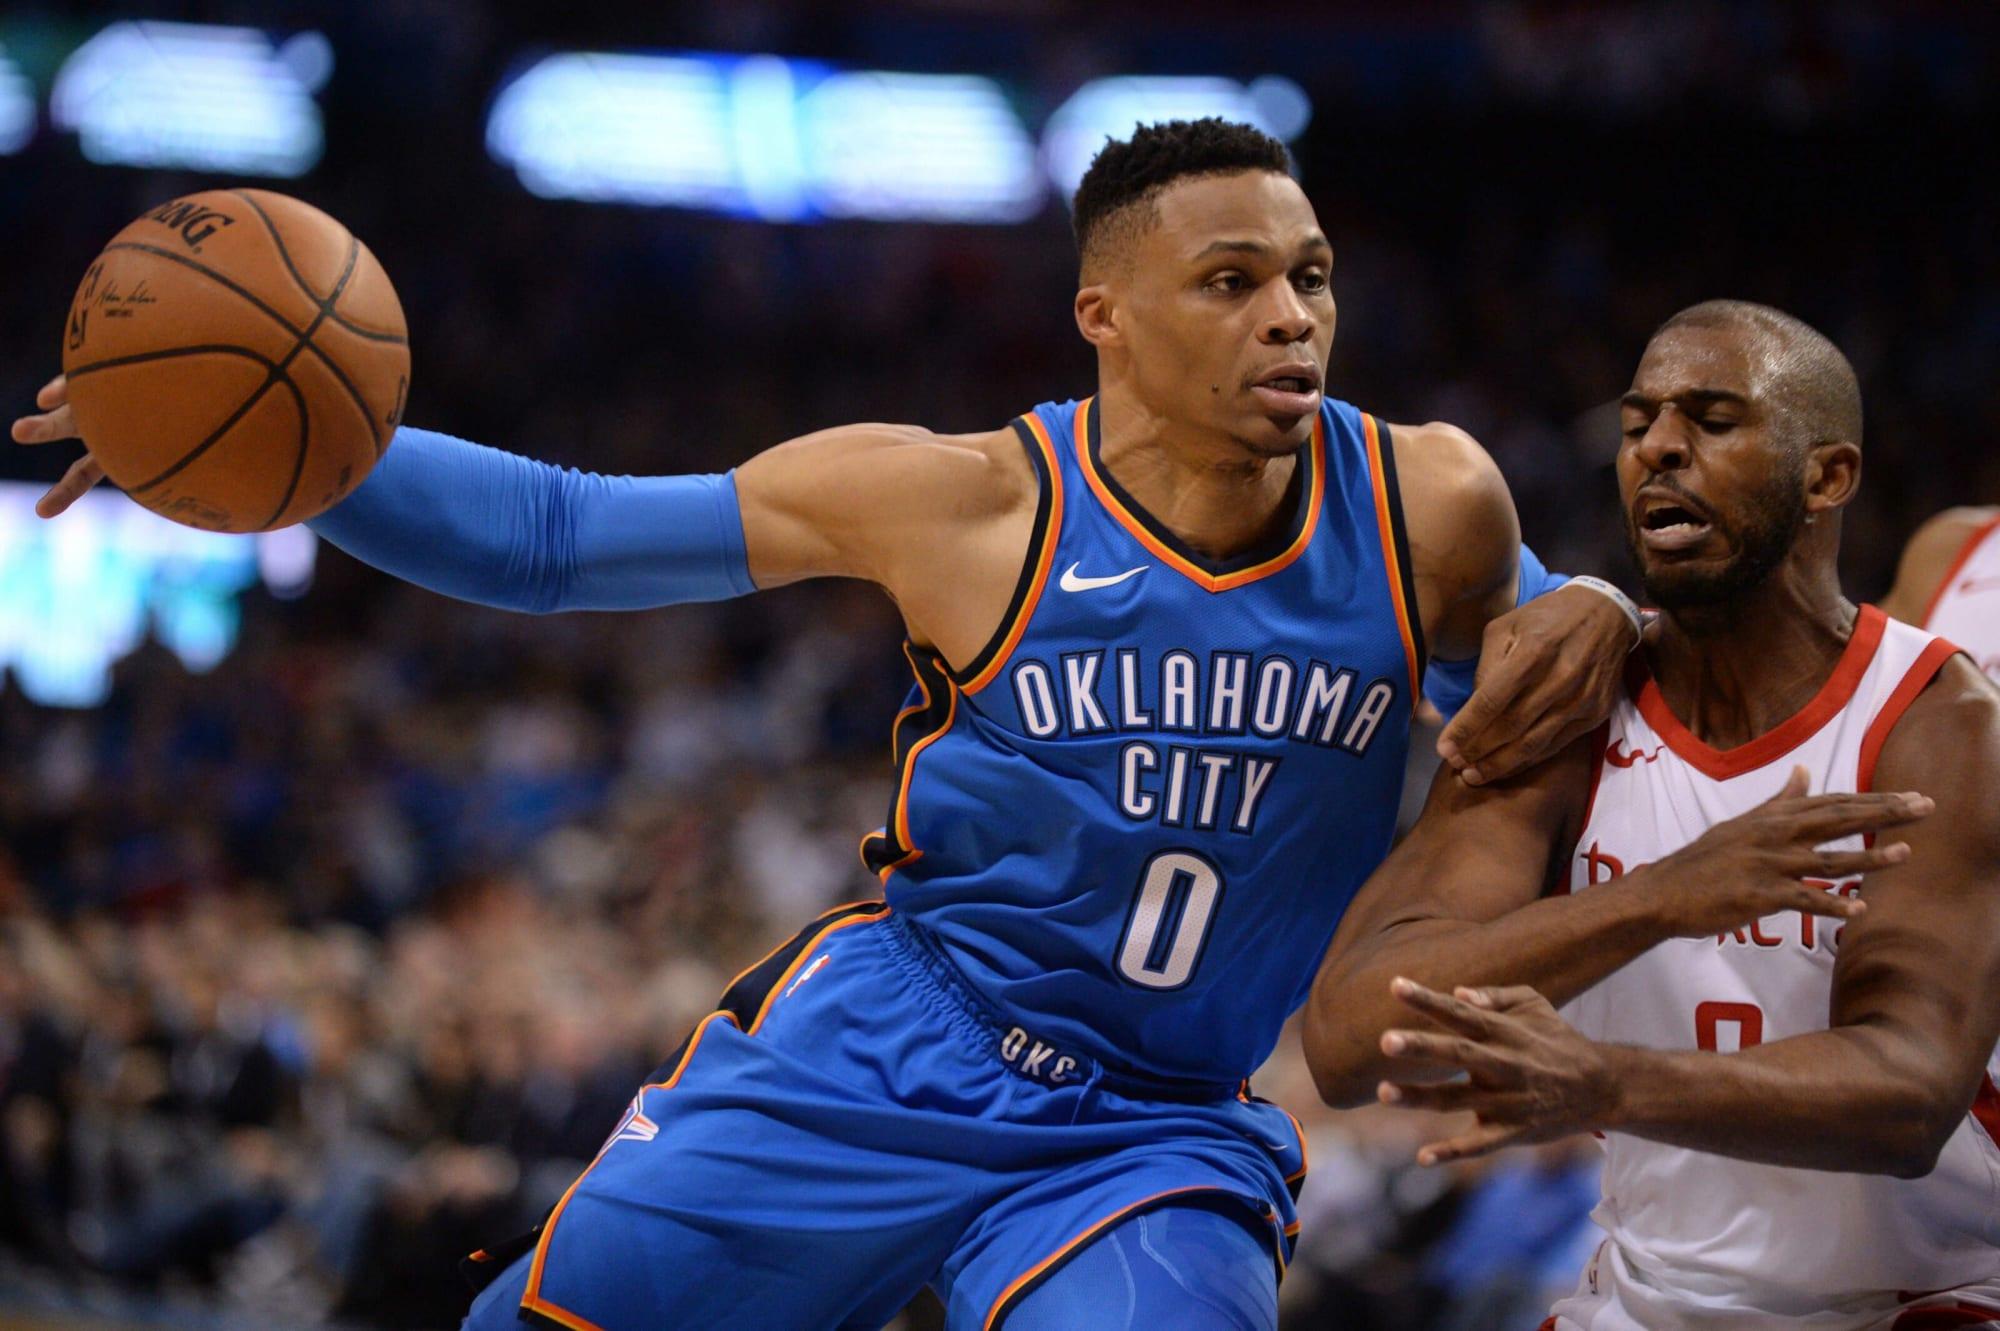 OKC Thunder: Sam Presti's eye for point guard talent witnessed all over NBA